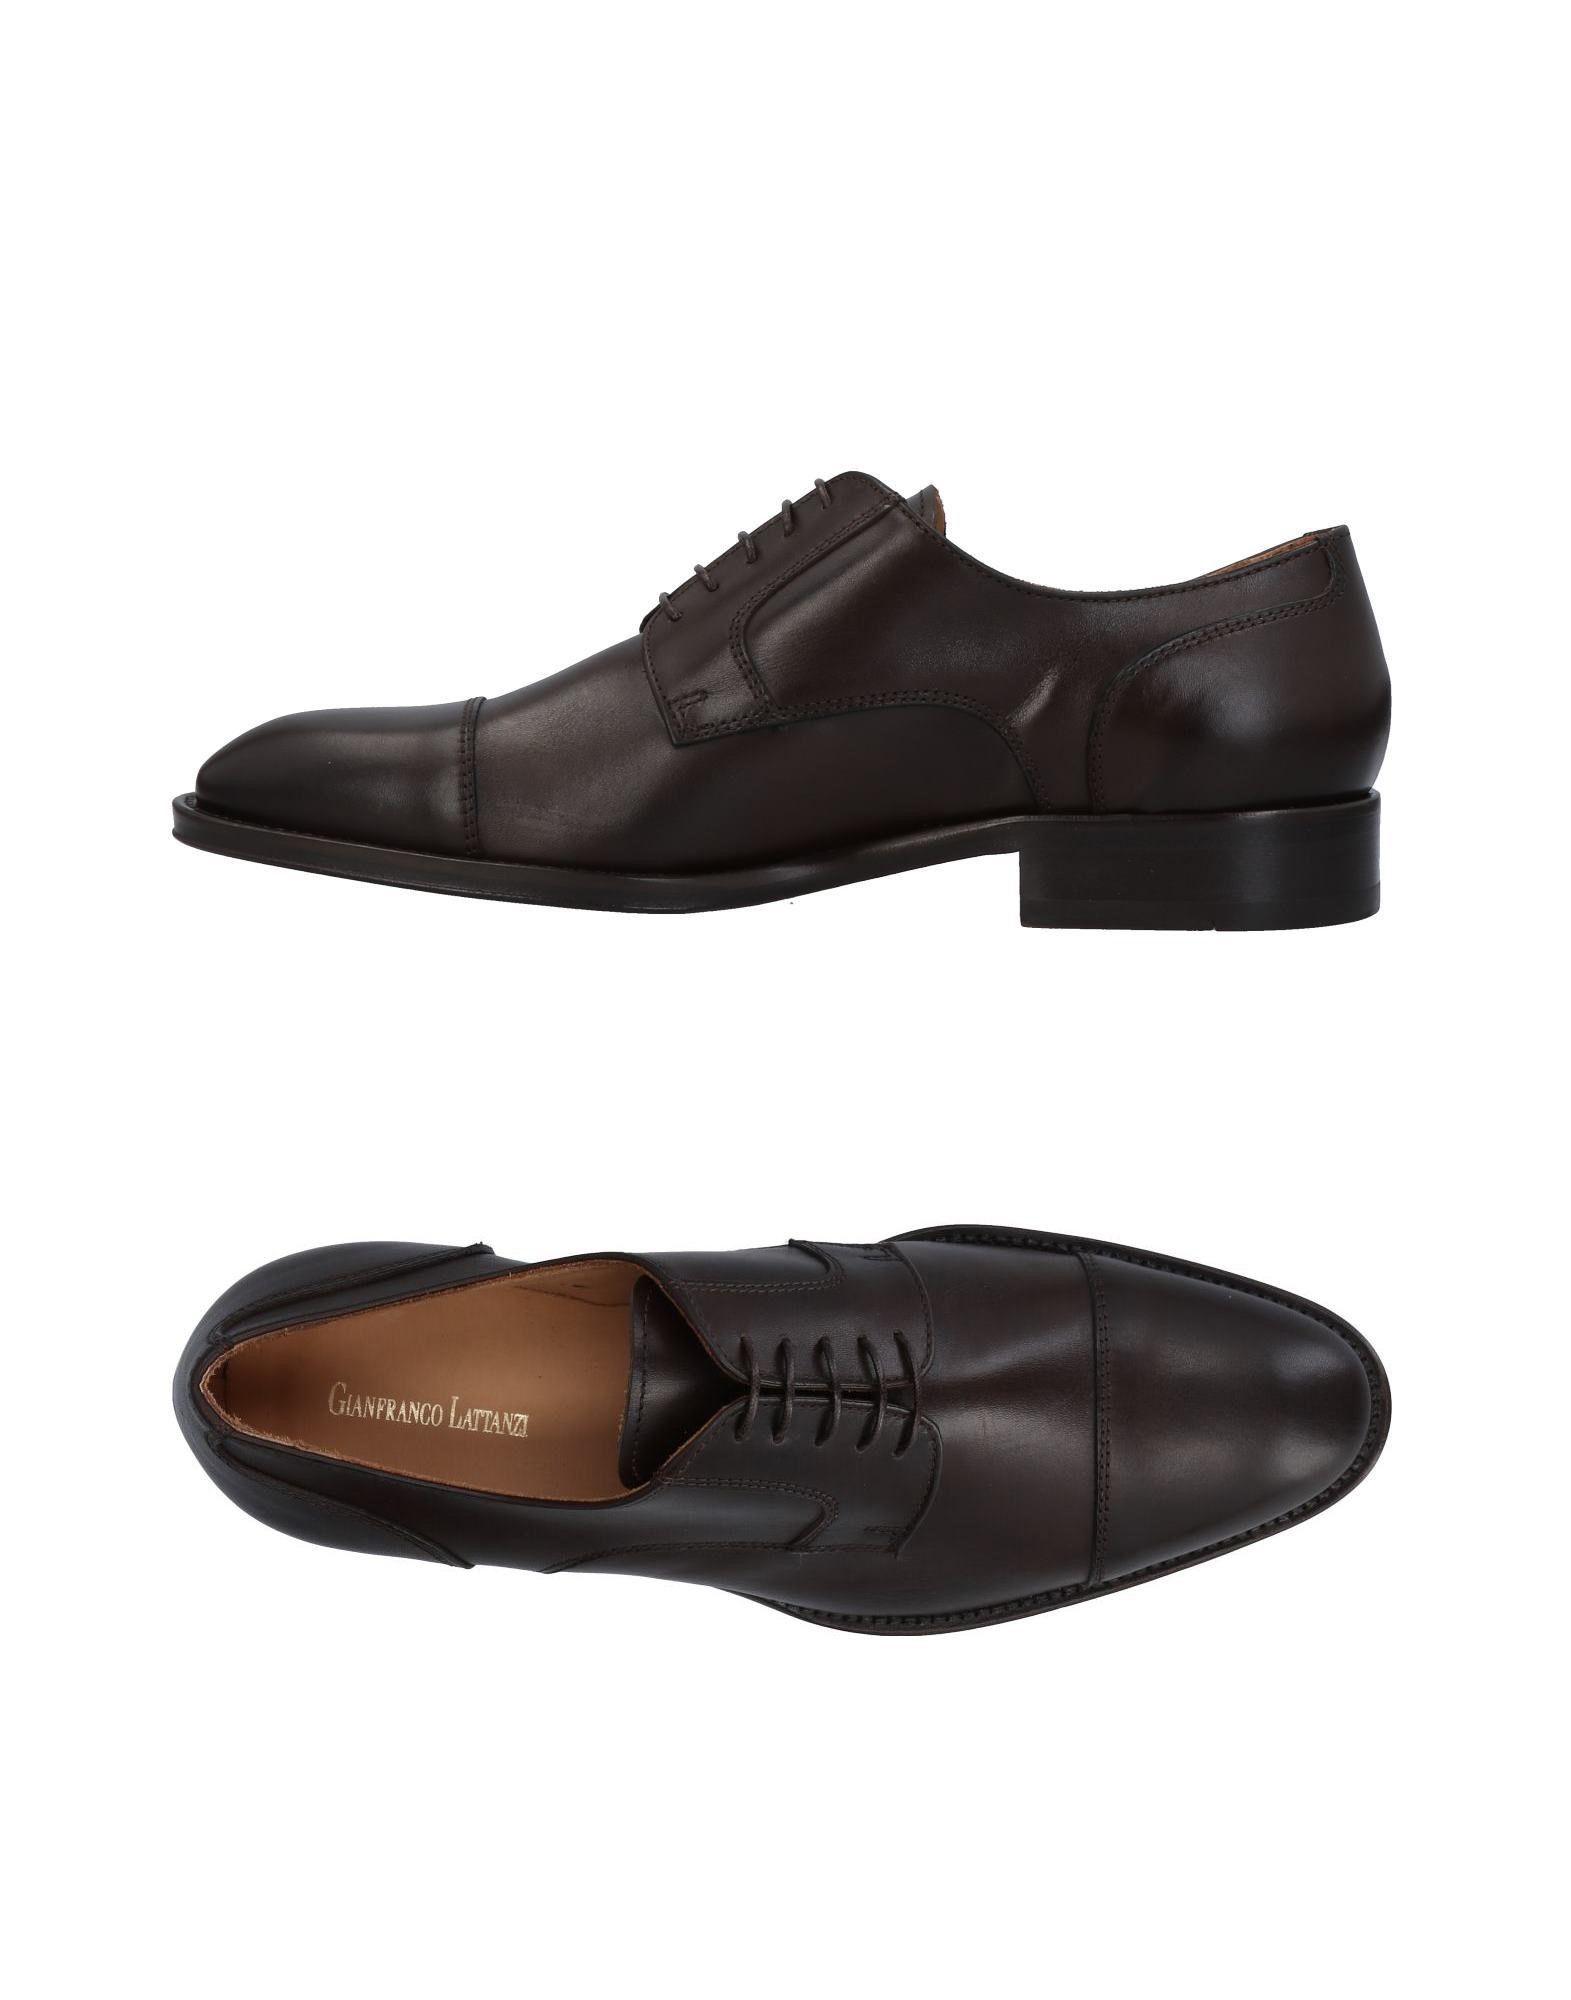 Gianfranco Lattanzi Schnürschuhe Herren  Schuhe 11453877TW Gute Qualität beliebte Schuhe  392cc5